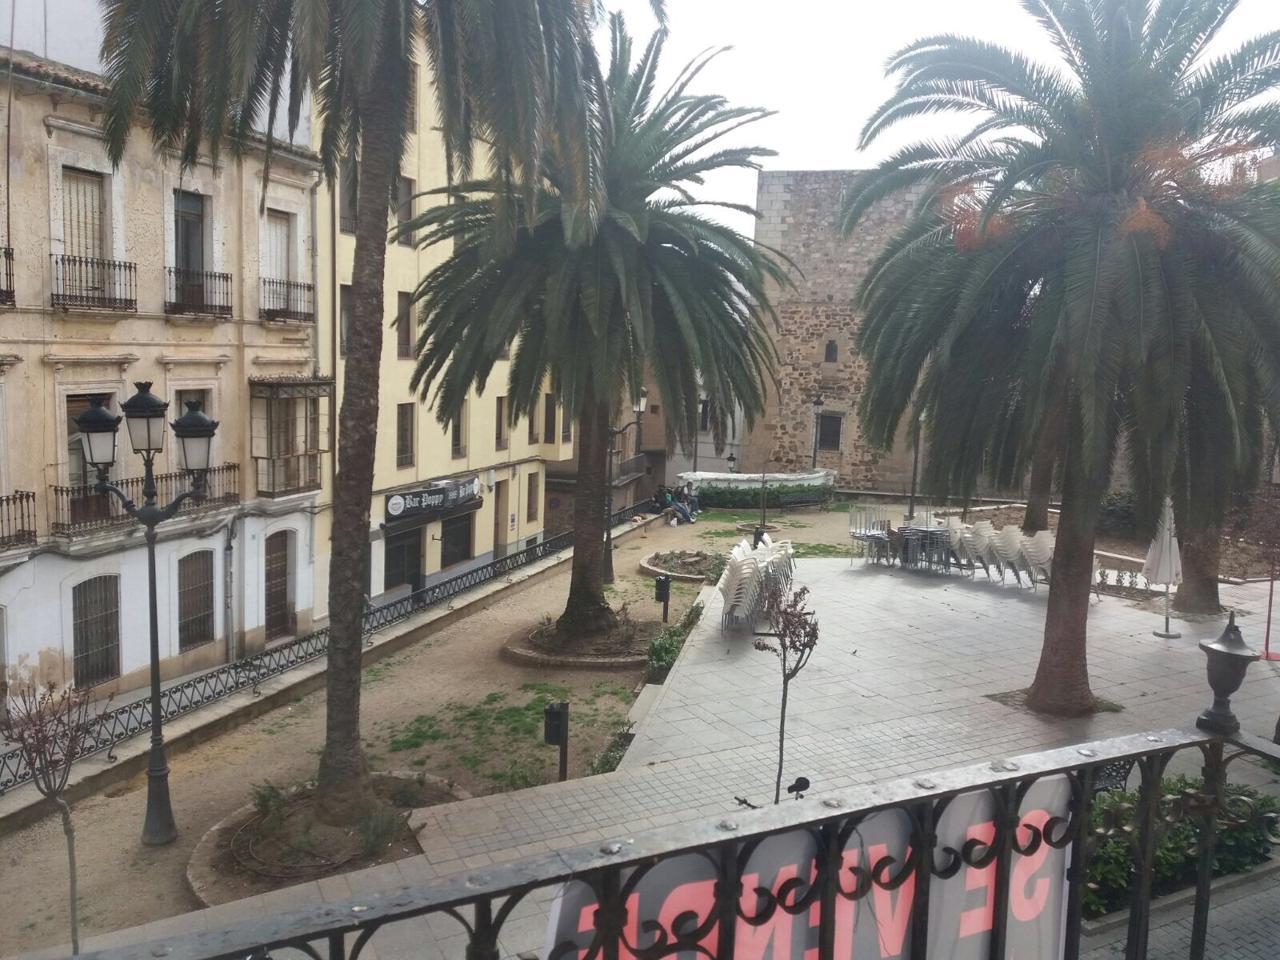 Piso en venta con 120 m2, 4 dormitorios  en Centro, Casco Antiguo (Các